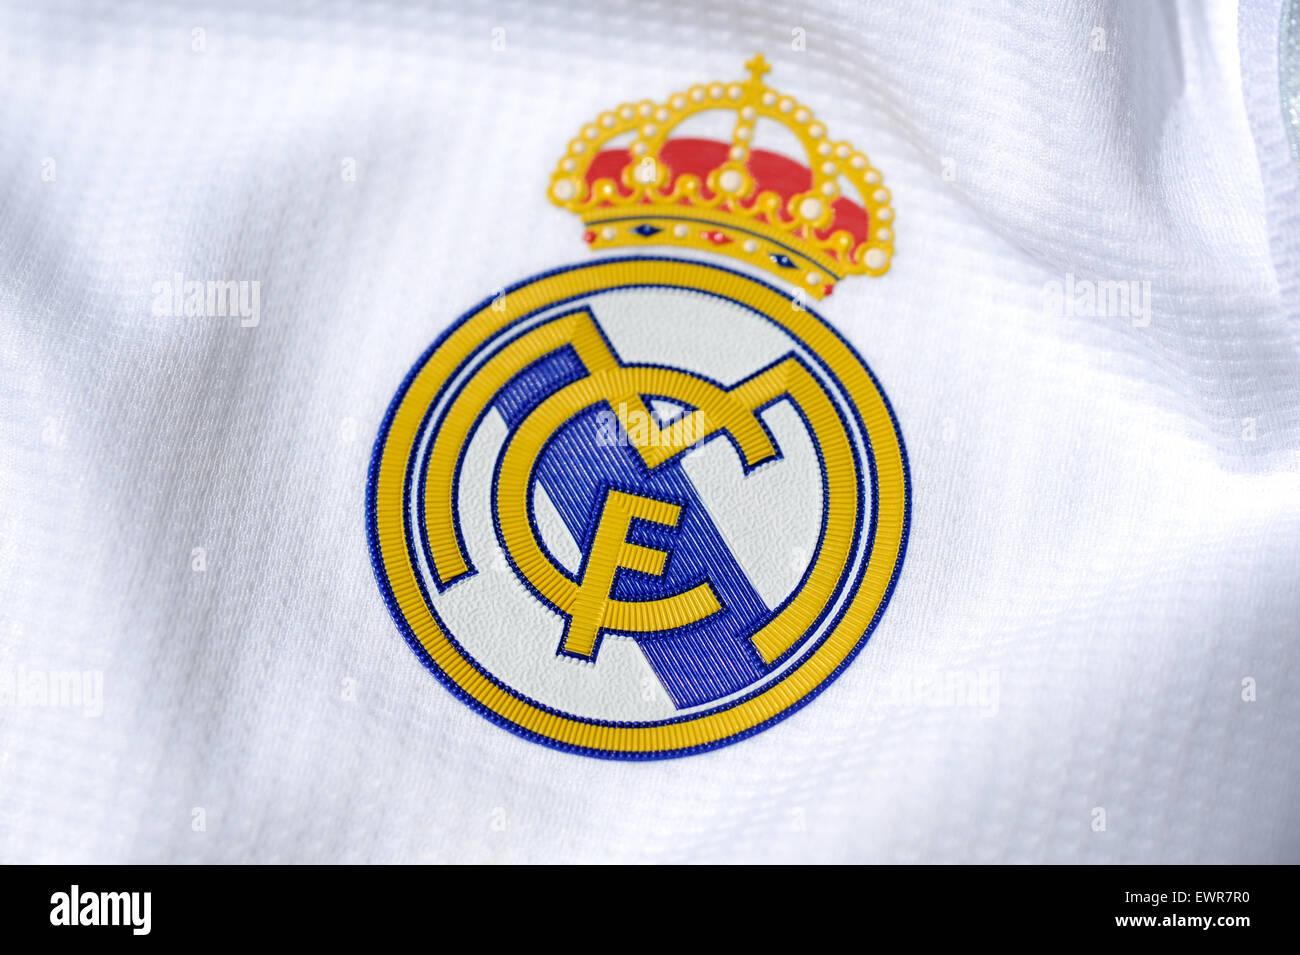 78d28b6c2ff Real Madrid Logo Stock Photos   Real Madrid Logo Stock Images - Alamy